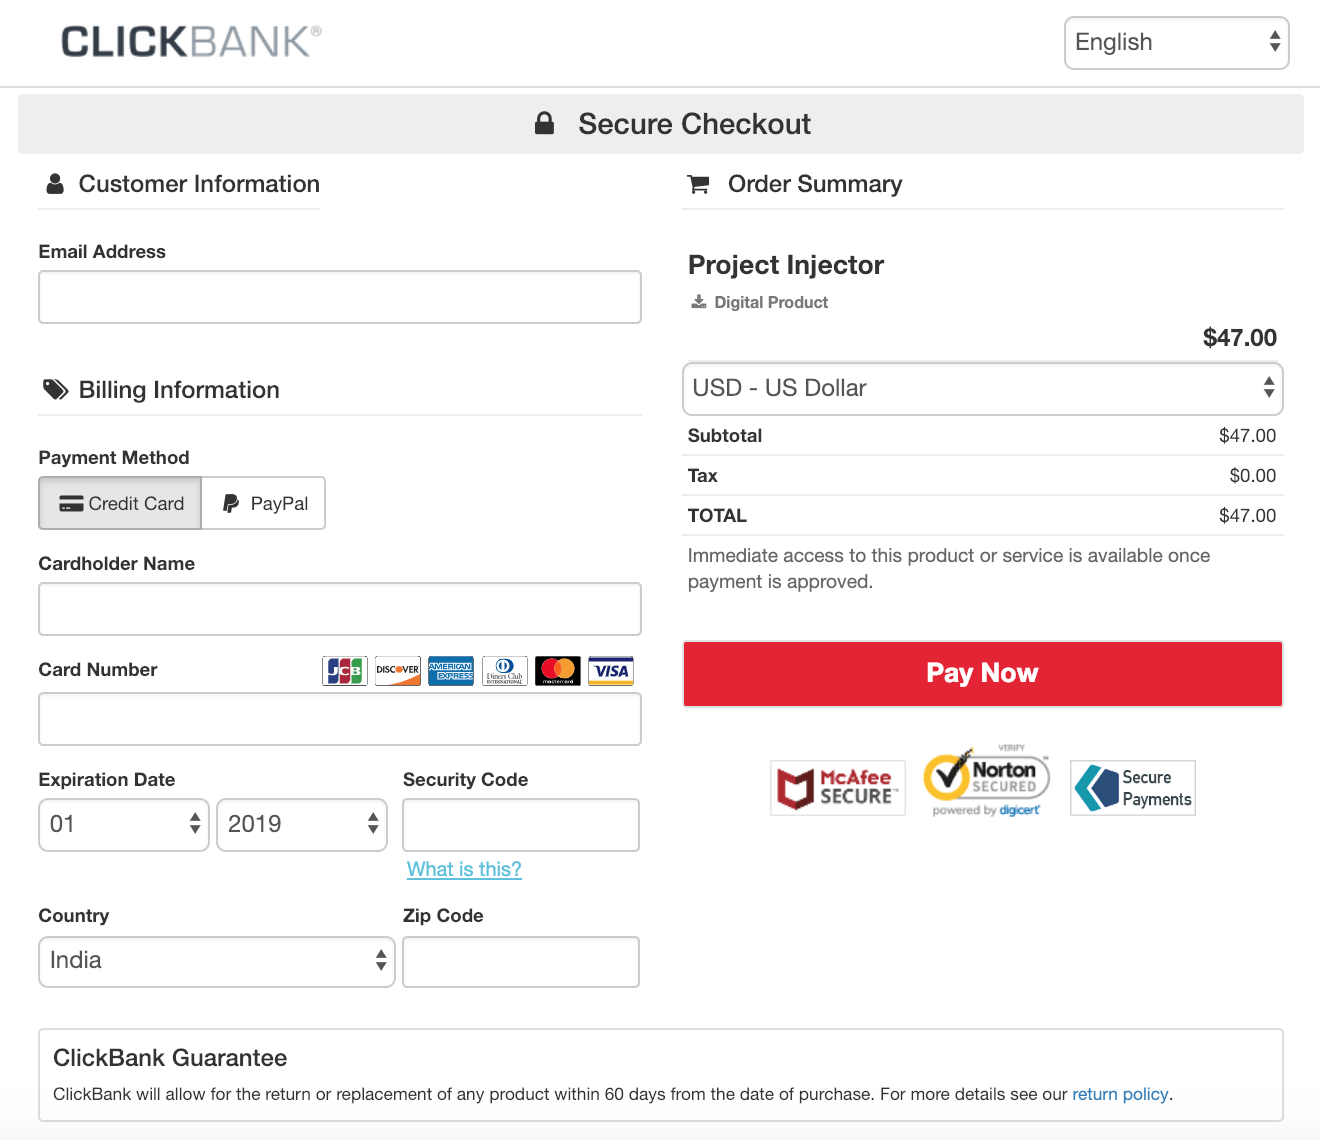 Profit Injector Discount